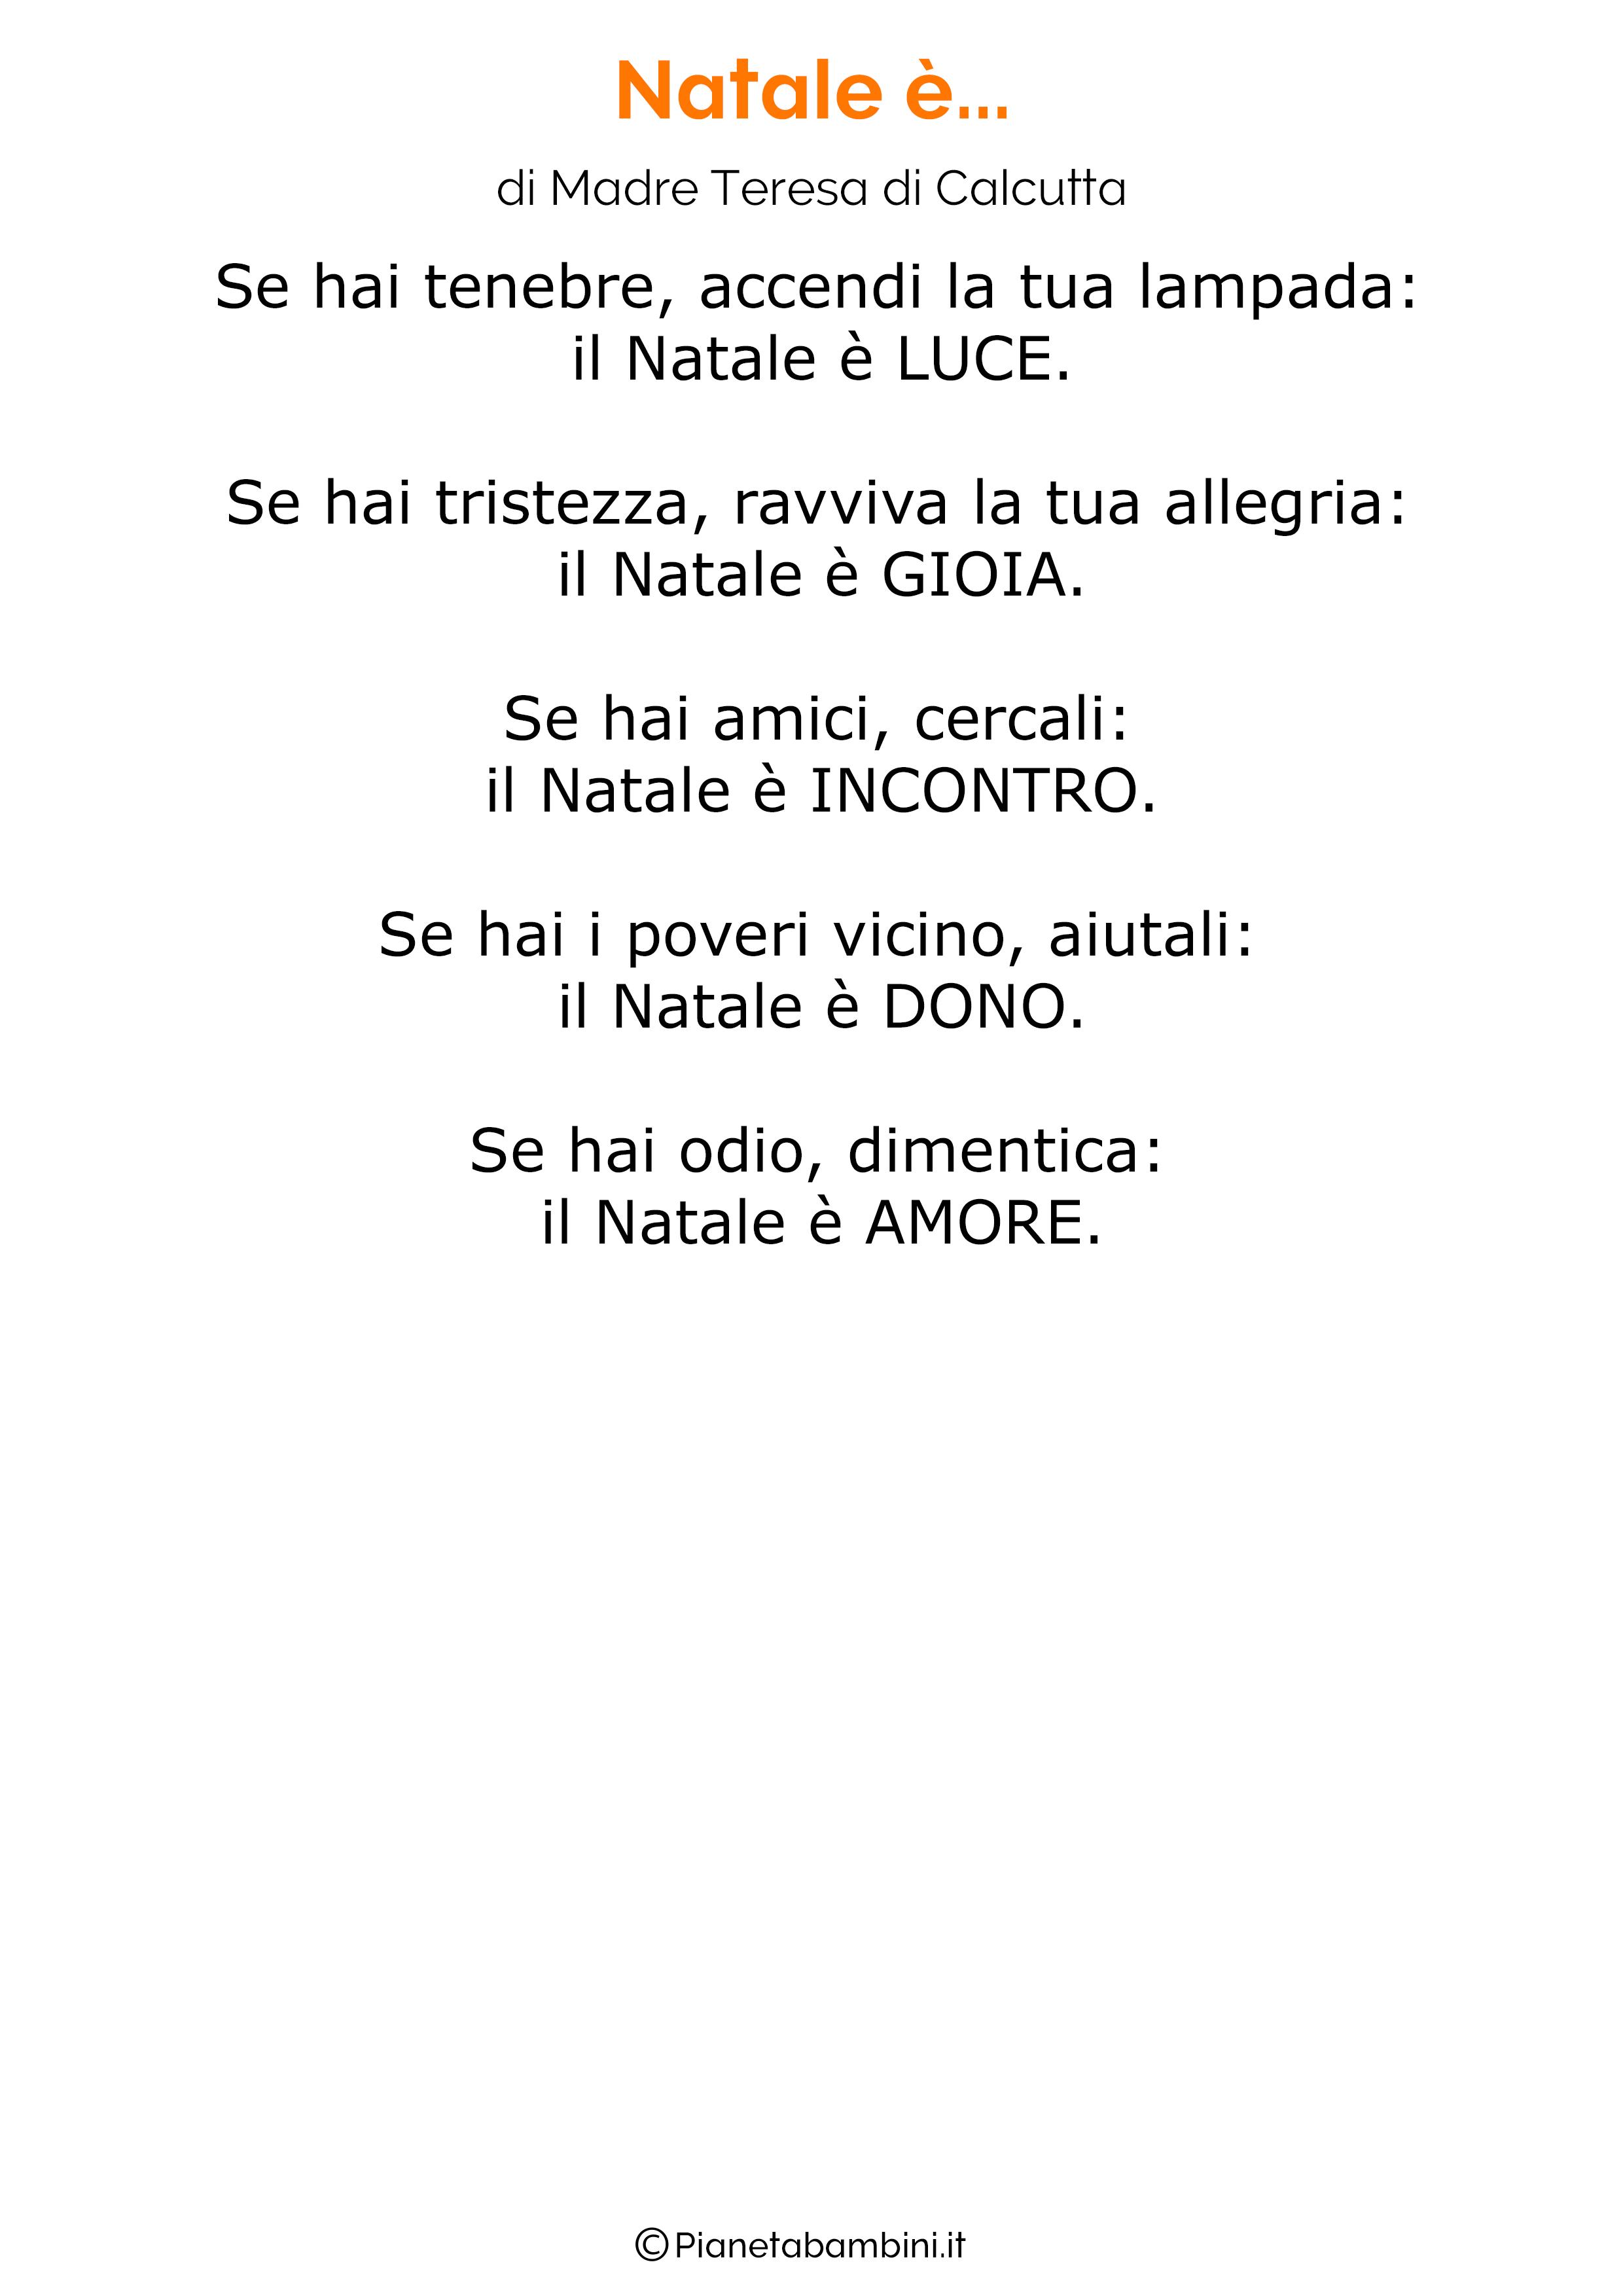 Poesie Di Natale 3 Media.45 Poesie Di Natale Per Bambini Natale Christmas Time Christmas